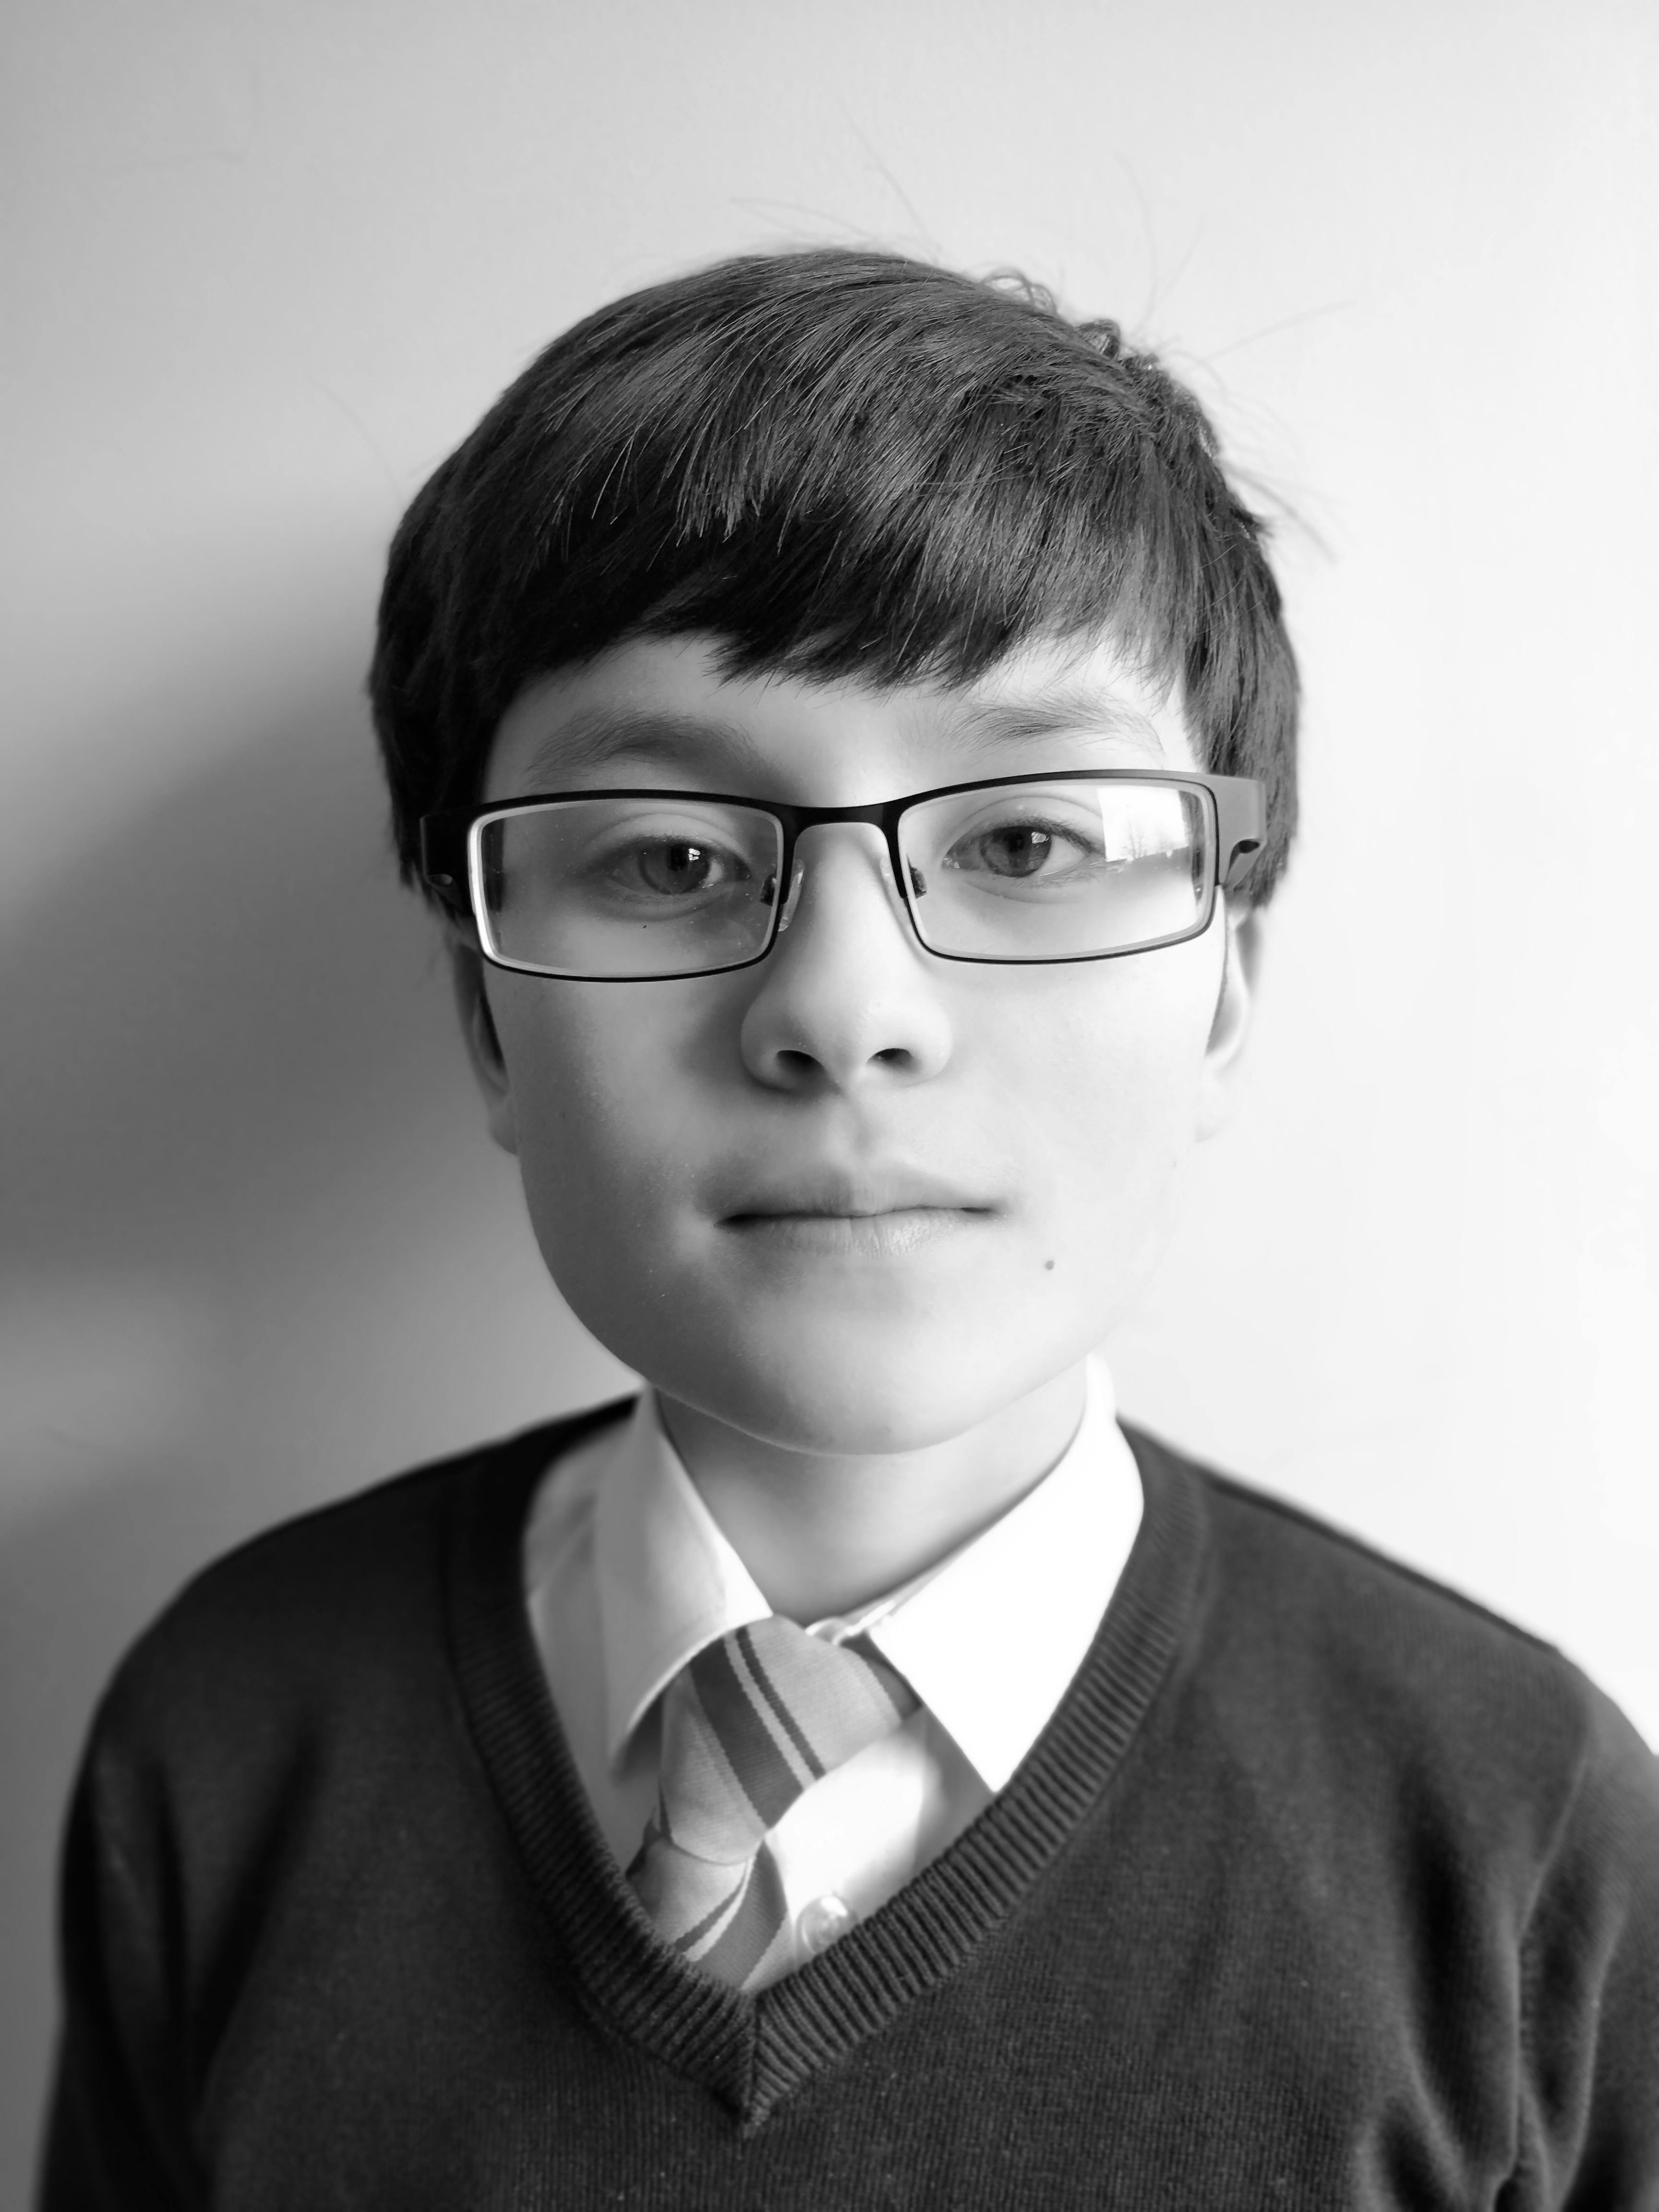 Nicolas Ong